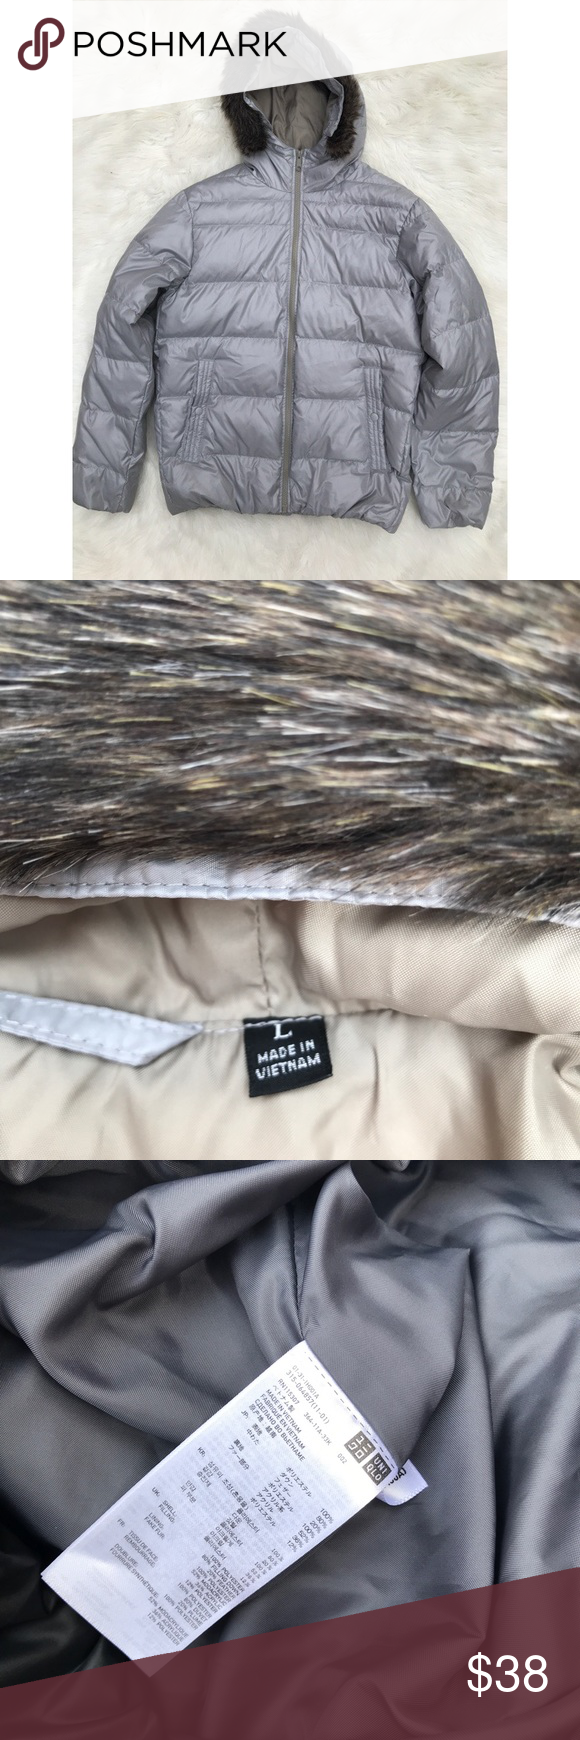 Men's Uniqlo Light Puffer Jacket with Hood Jackets